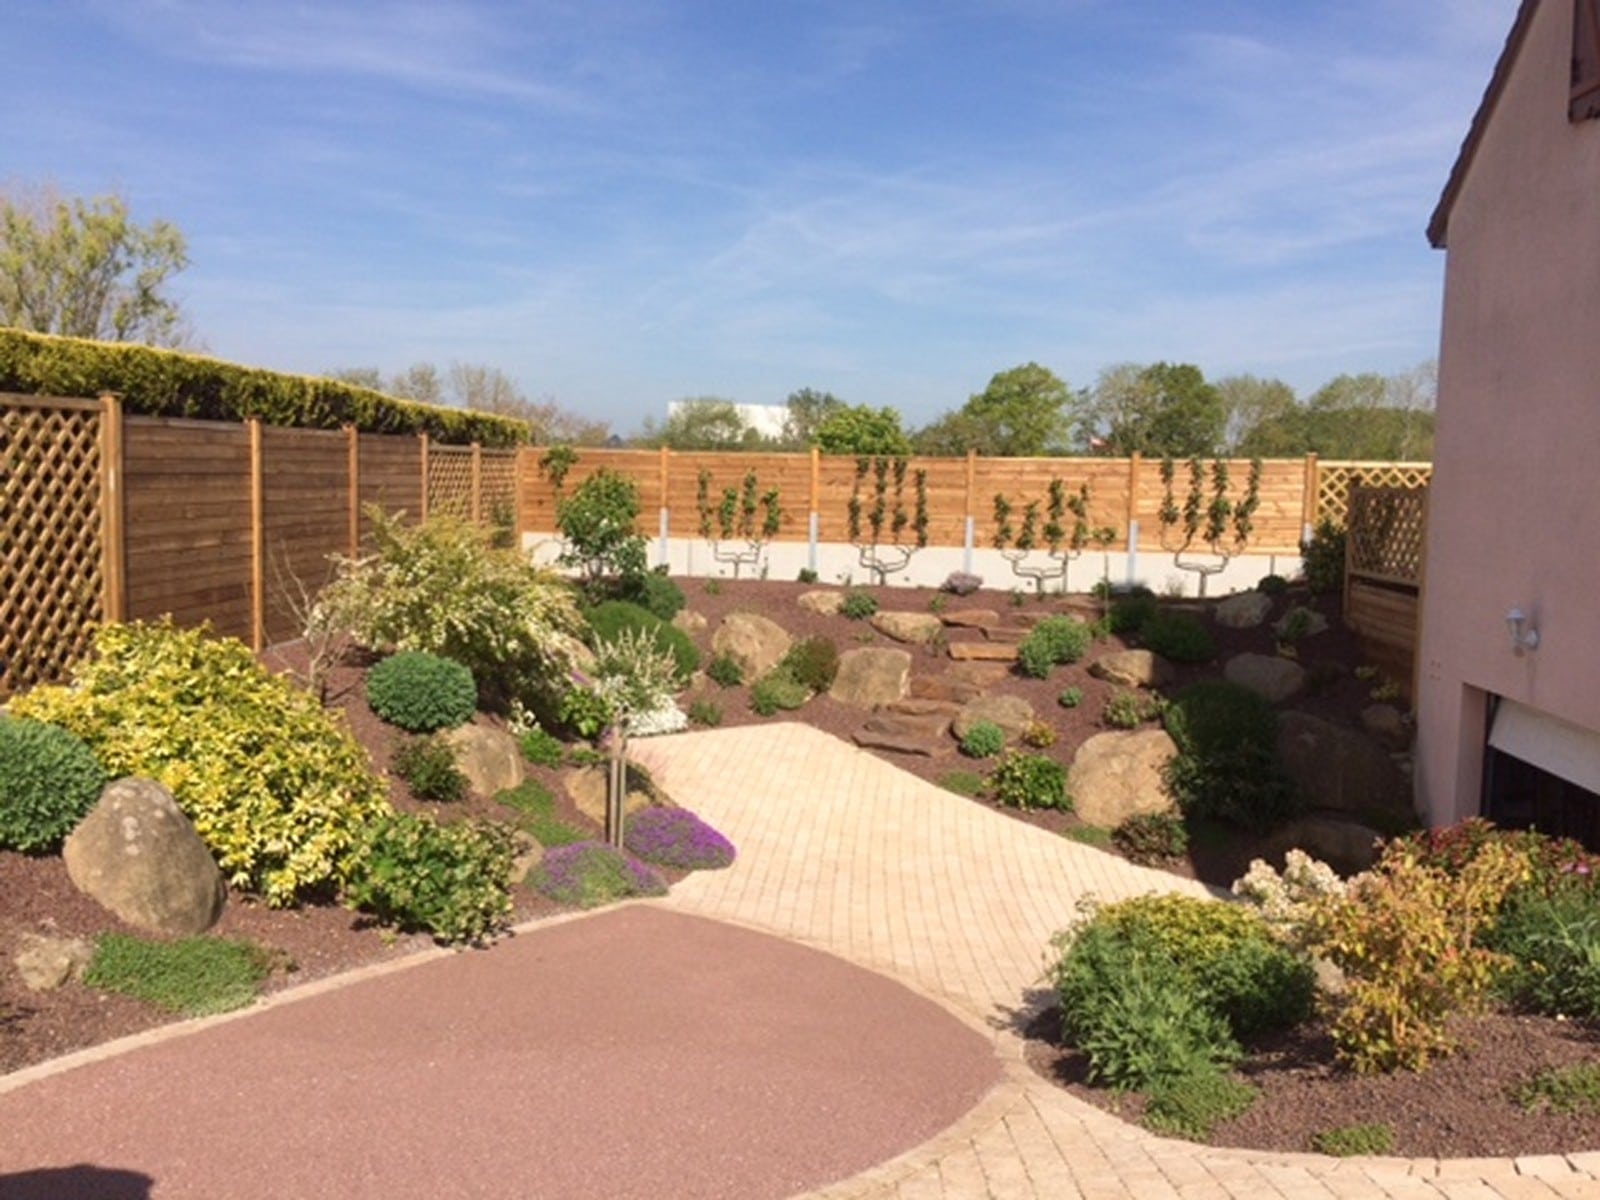 Aménager un jardin à Argentan, Orne